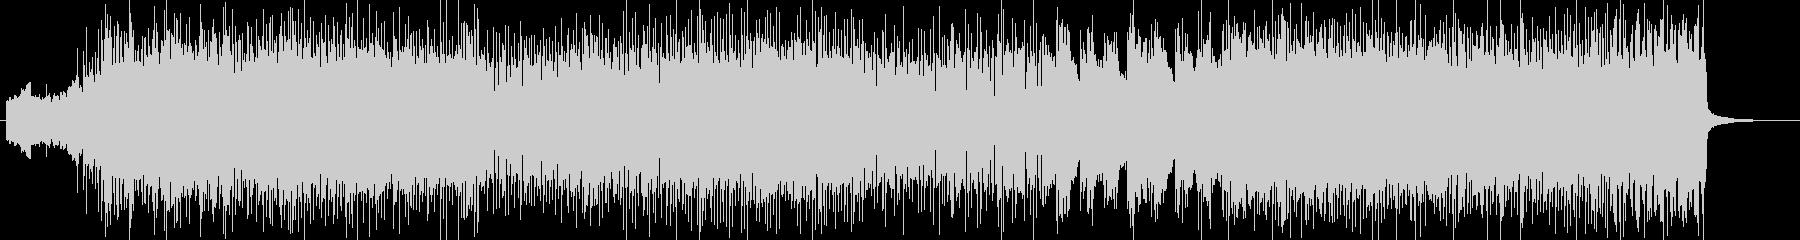 「HR/HM」「DEAD」BGM138の未再生の波形